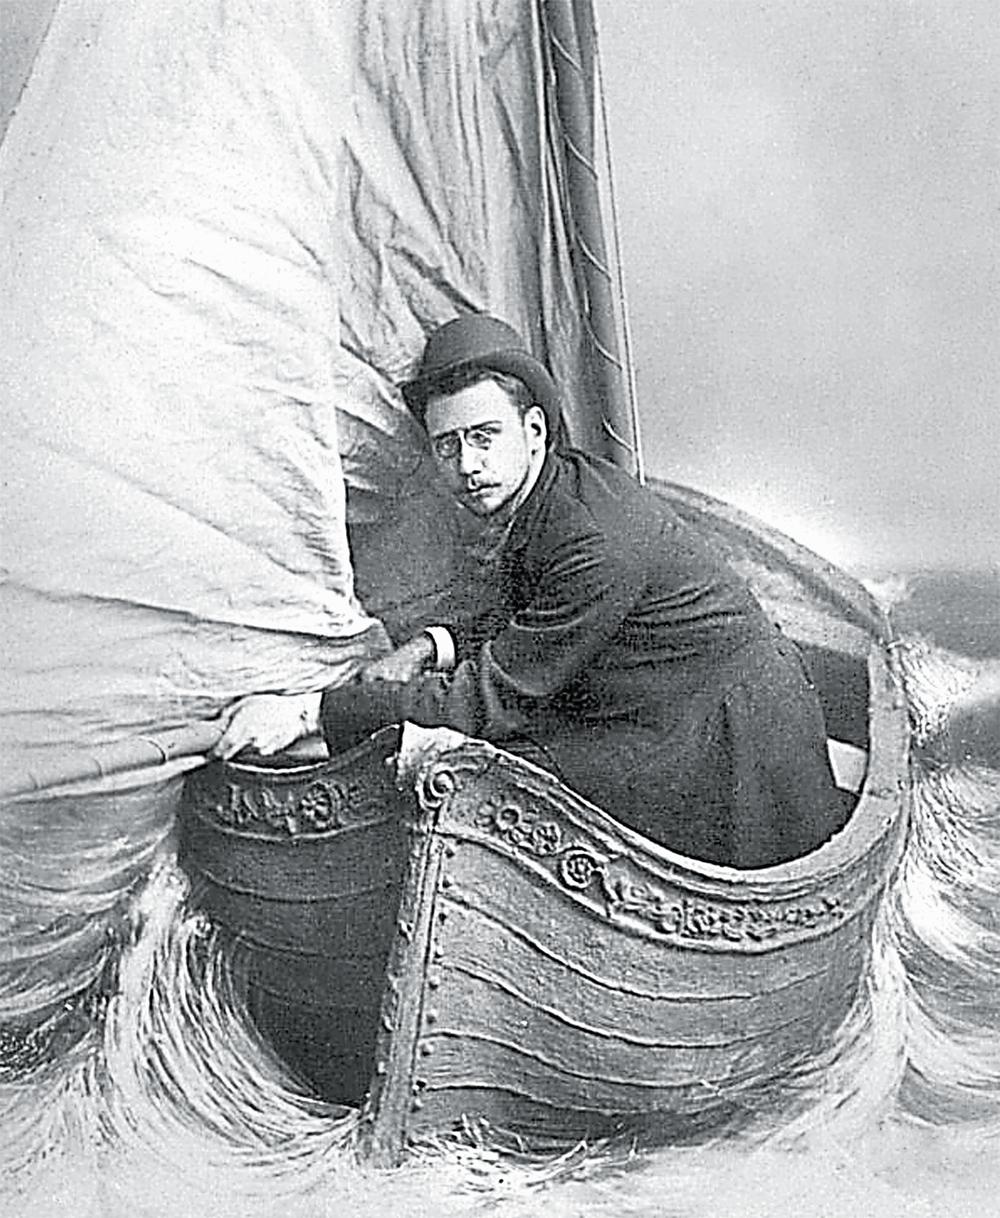 Алексей Бахрушин. Харьков, январь 1890 г.